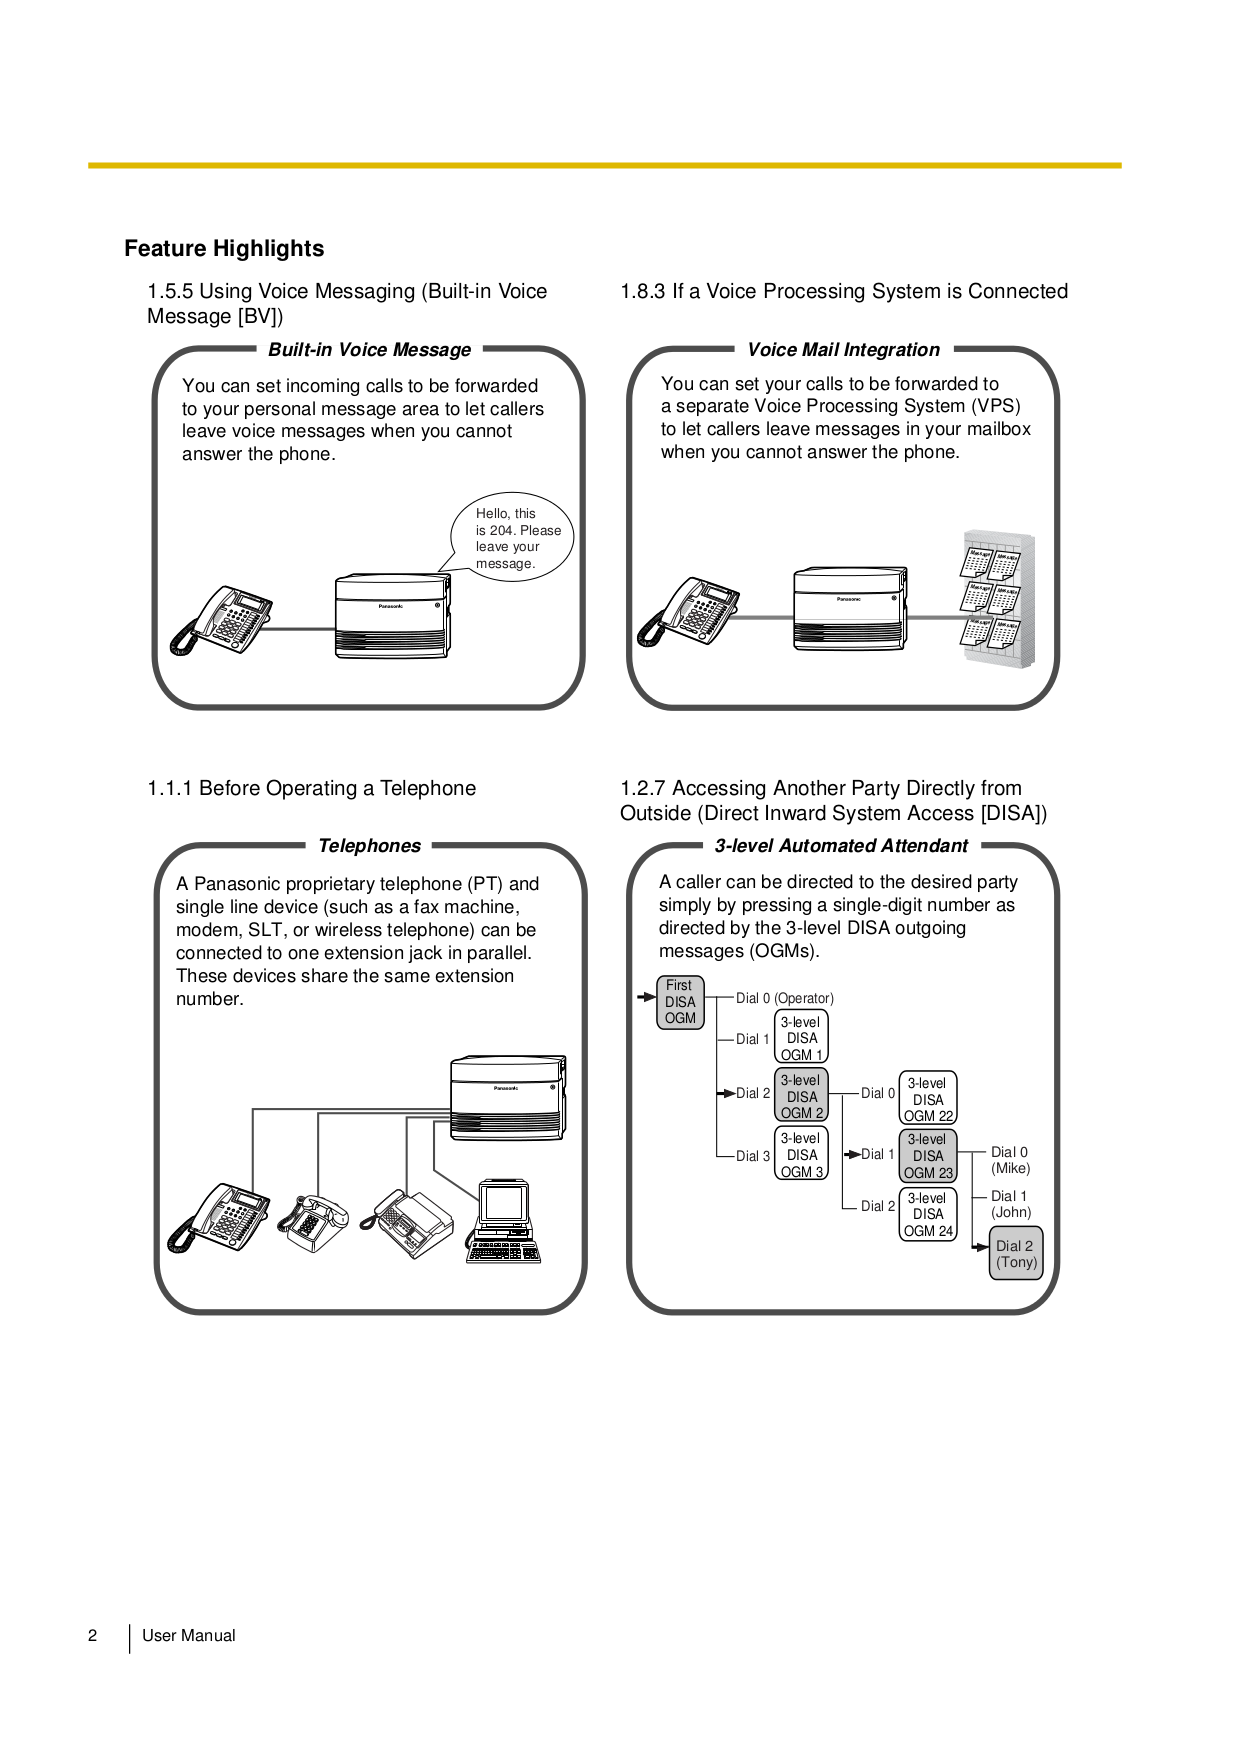 pdf manual for panasonic telephone kx dt333 rh umlib com panasonic kx dt333 manuale italiano panasonic kx dt333 manual en español